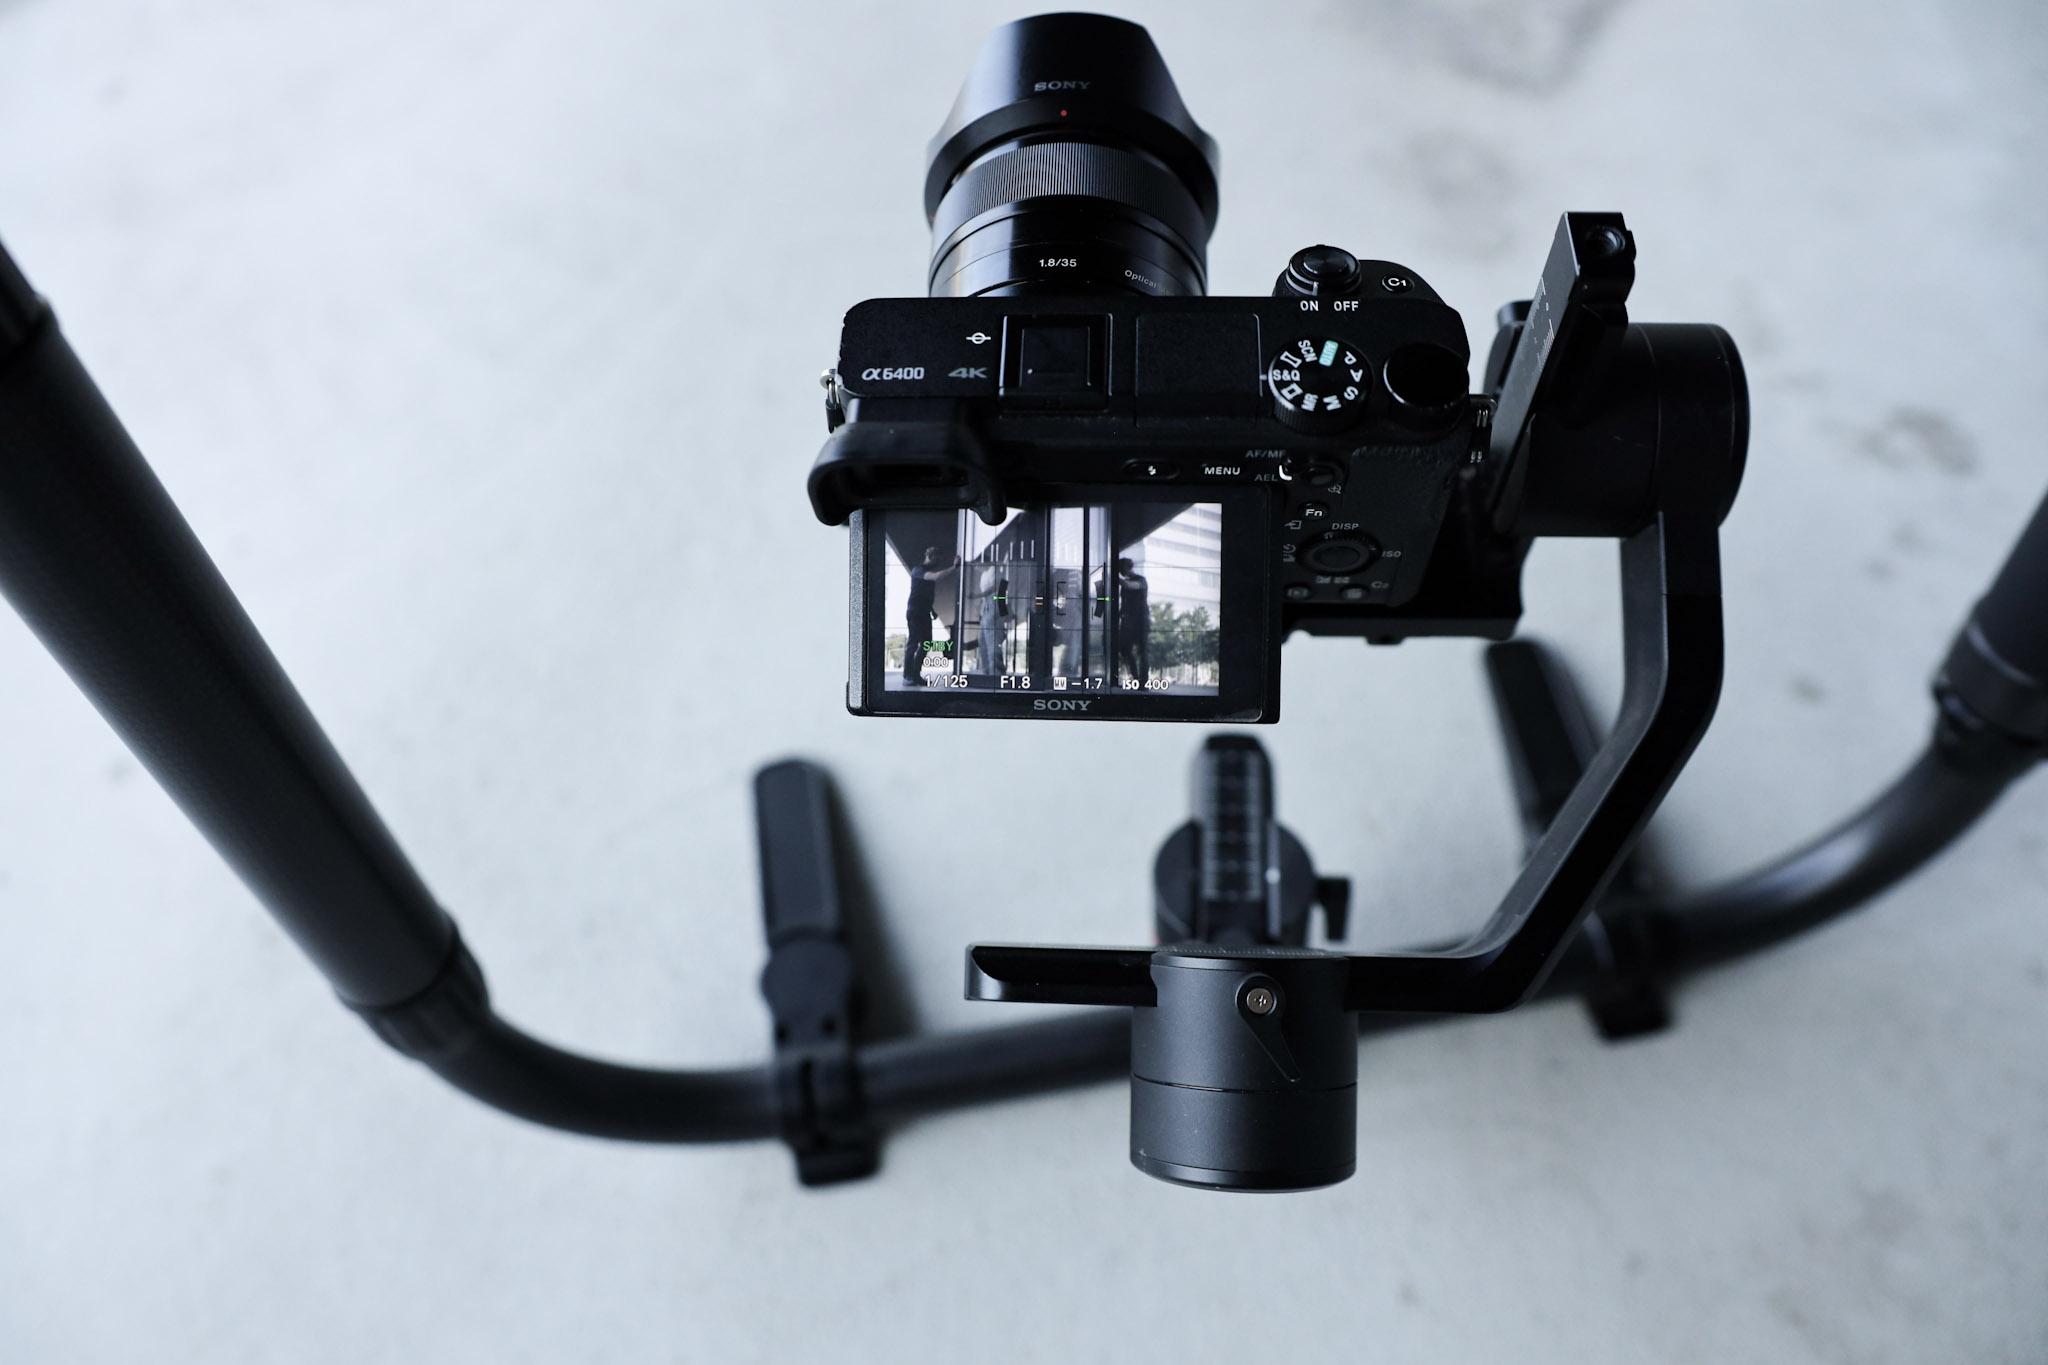 Kamera und Gimbal